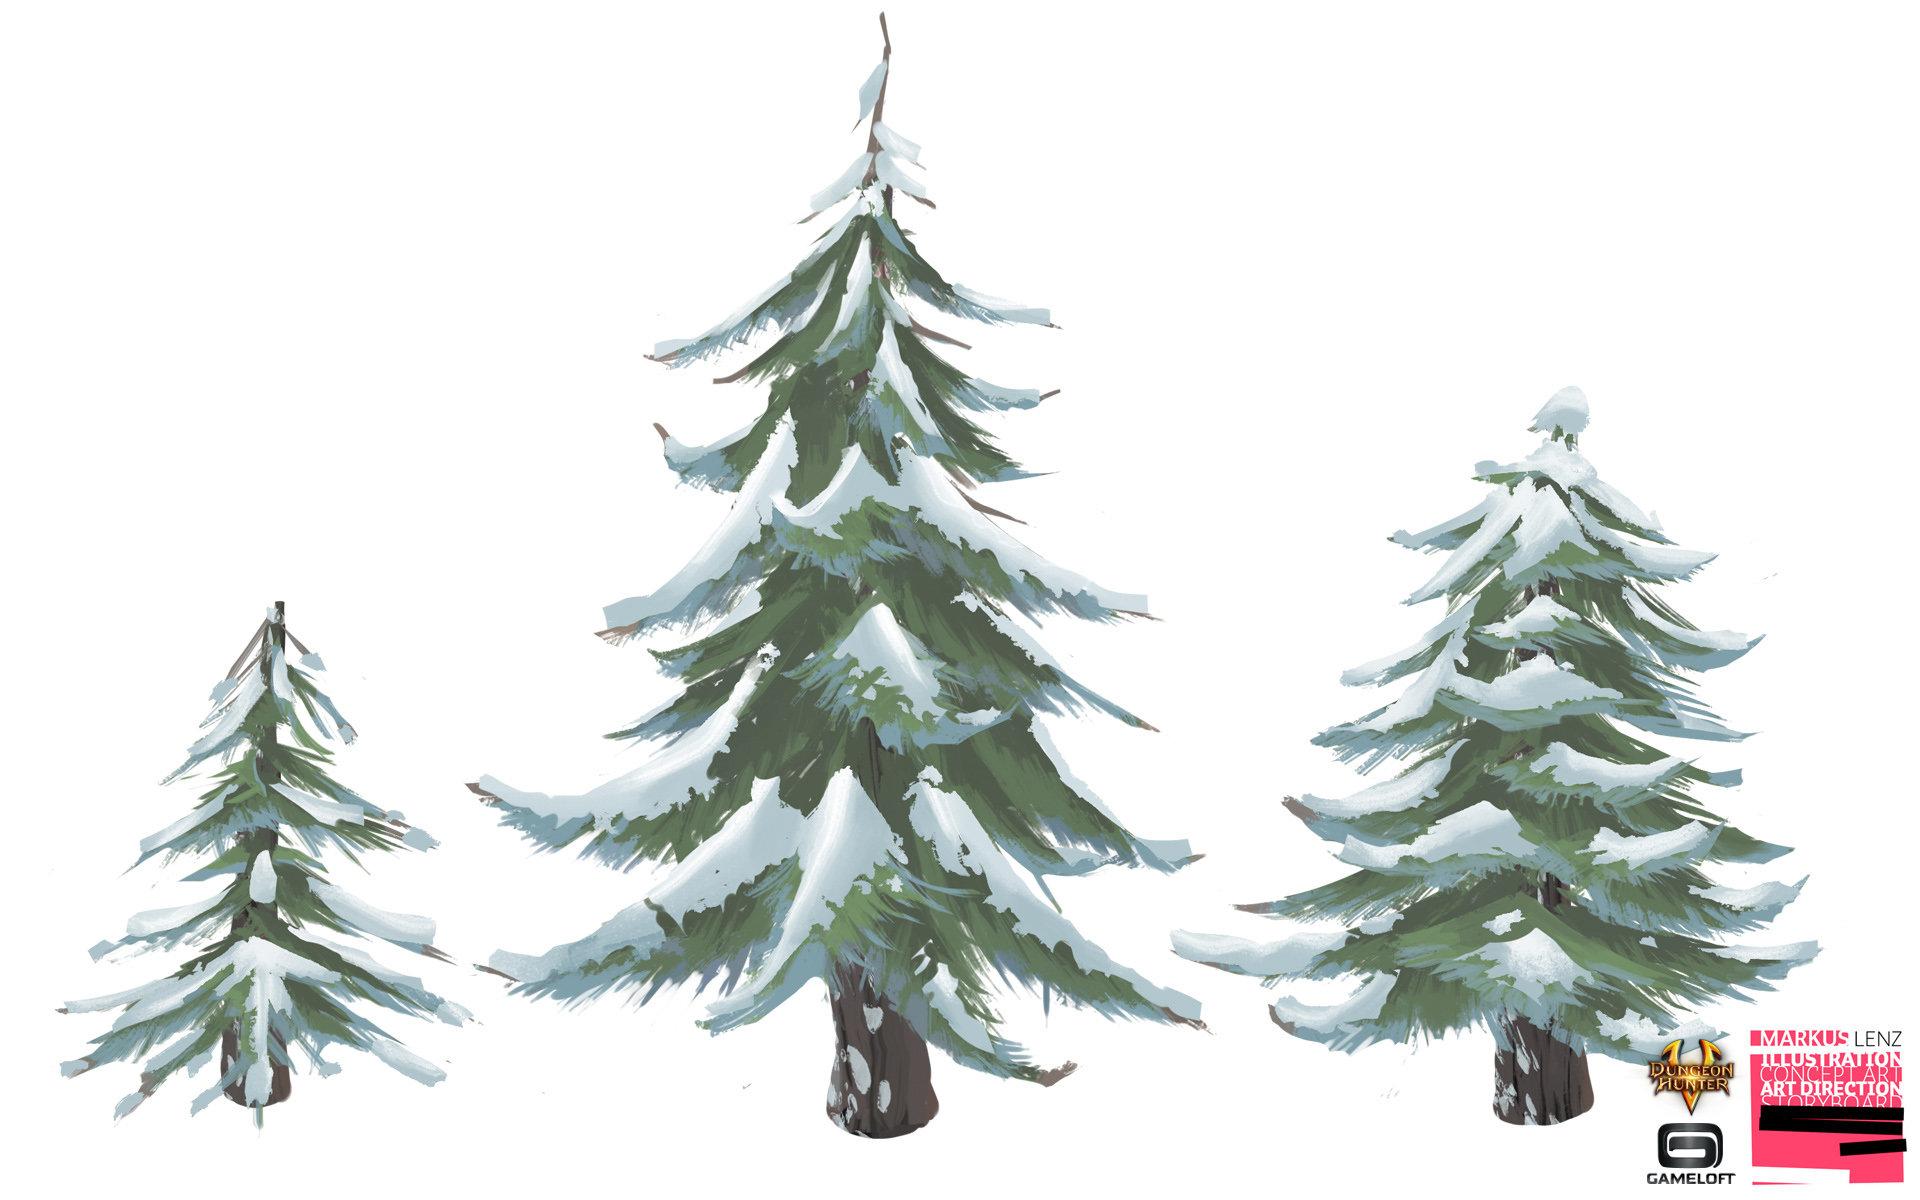 Markus lenz gameloft dh5 valenoutpost trees 02 ml